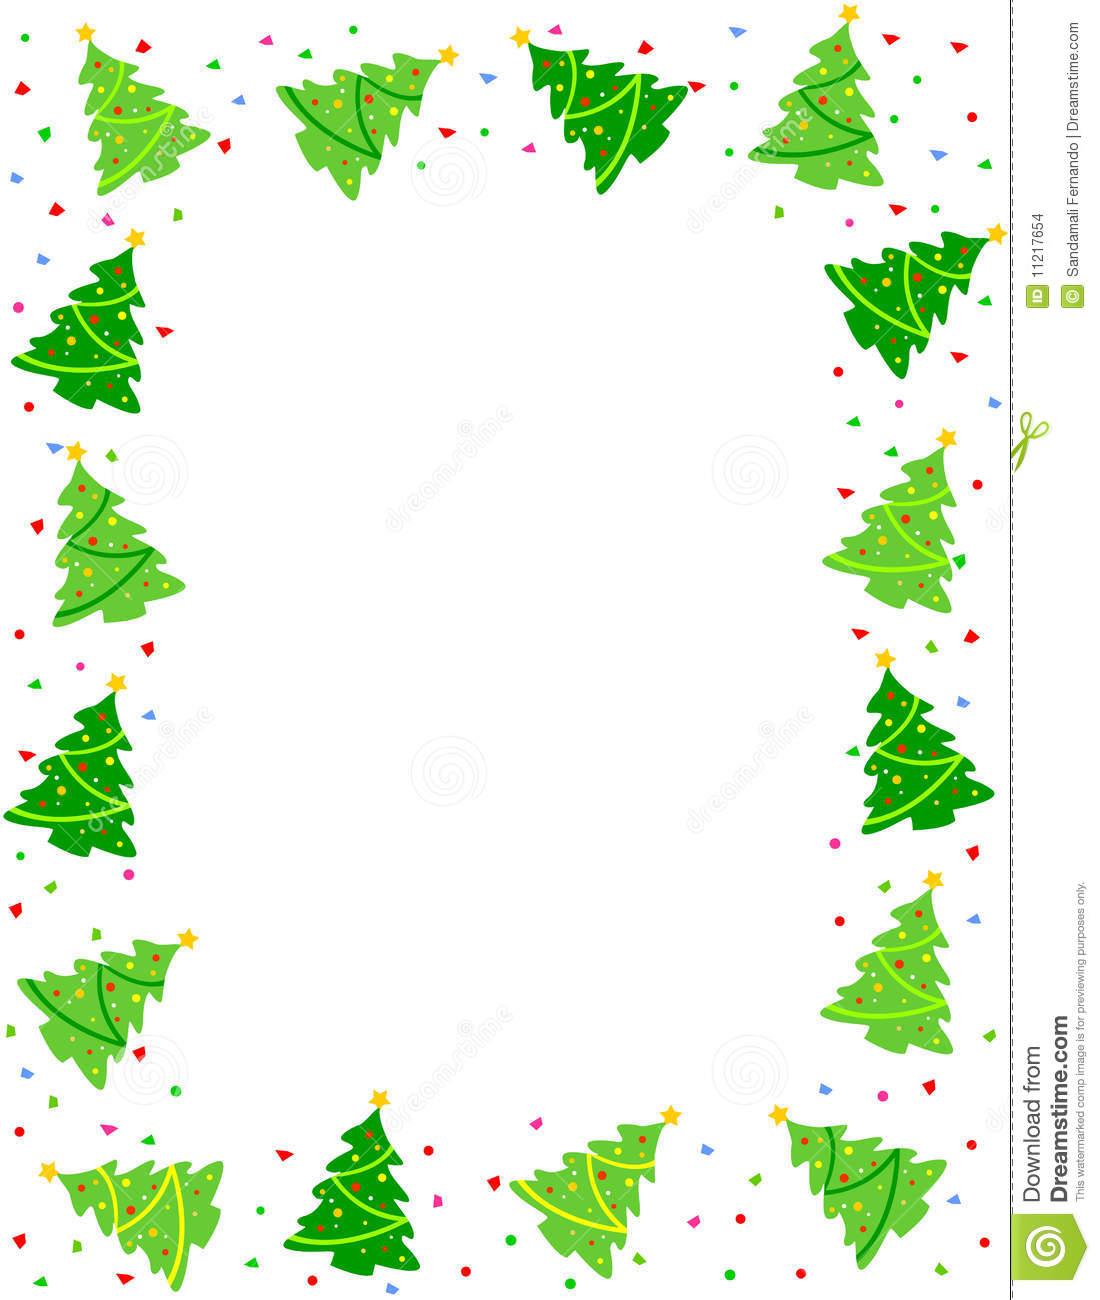 Christmas border clip art - .